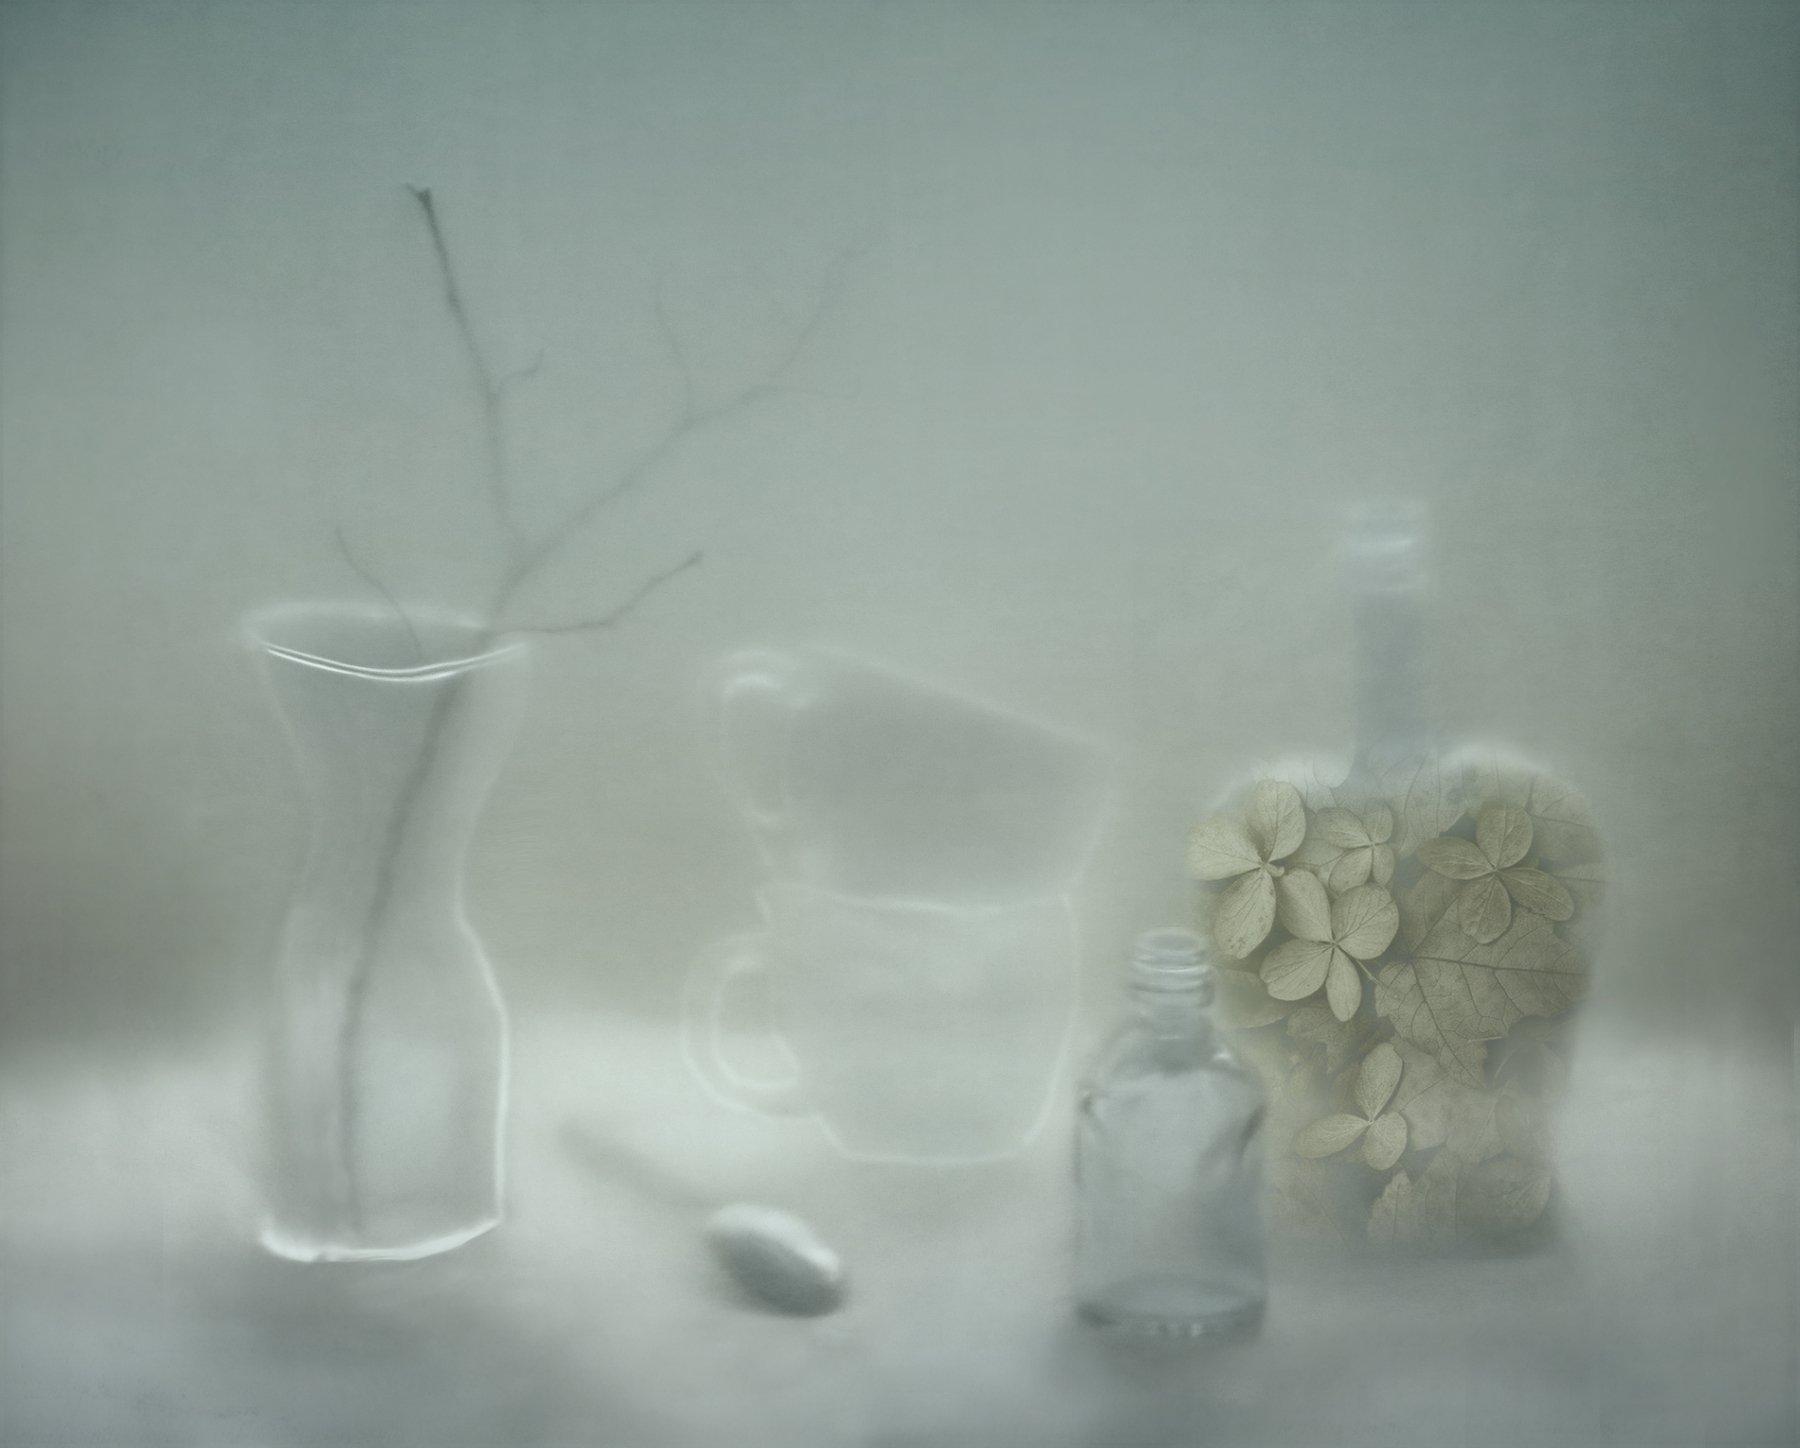 ветка, ваза, чашка, ложка, бутылка, стекло, Елена